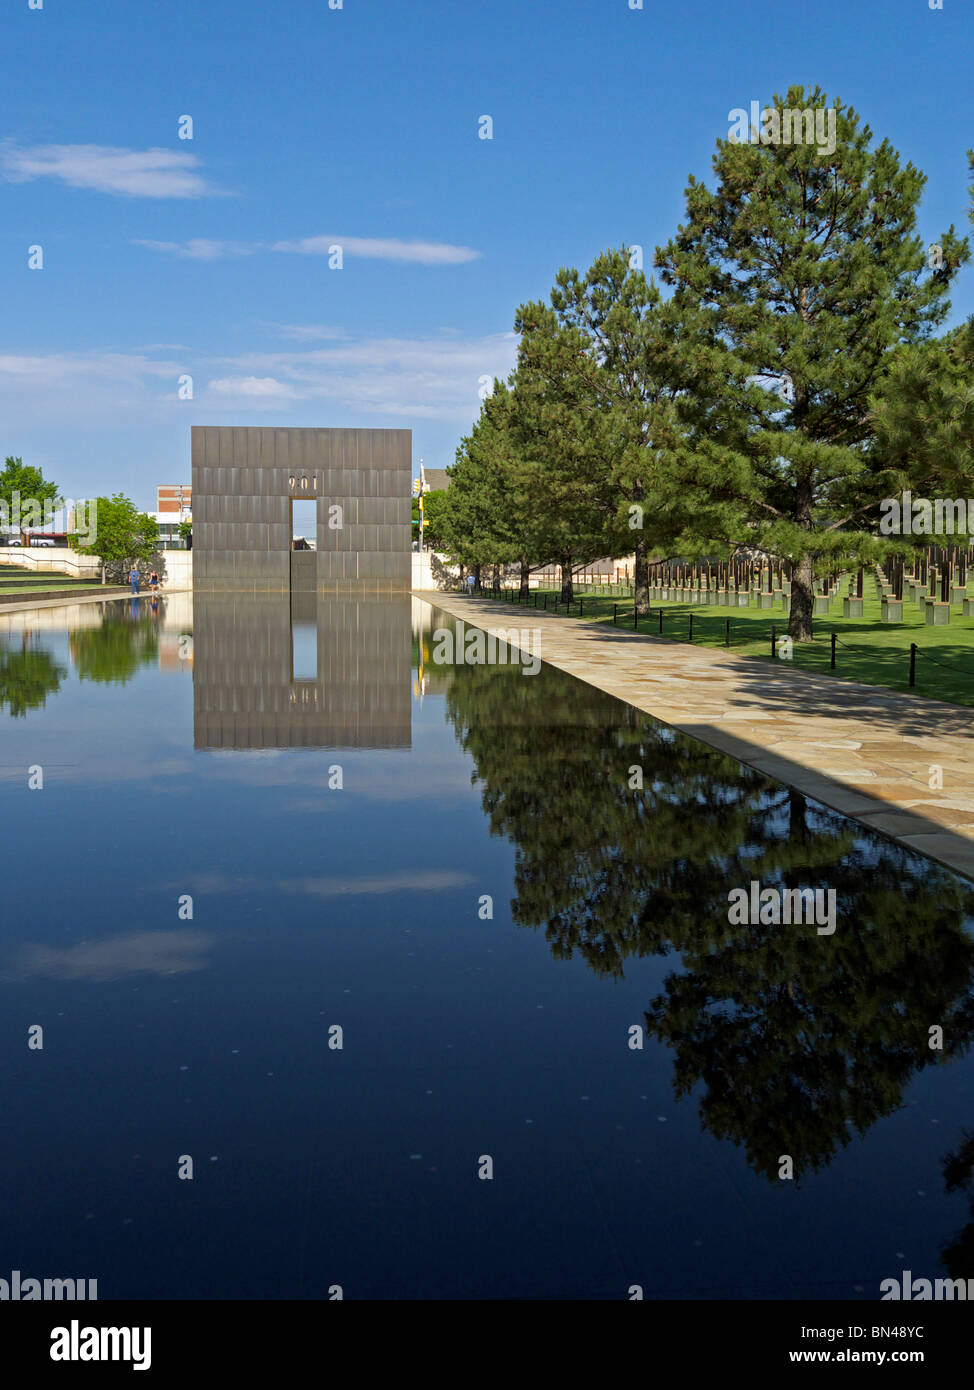 The Oklahoma City National Memorial. Stock Photo